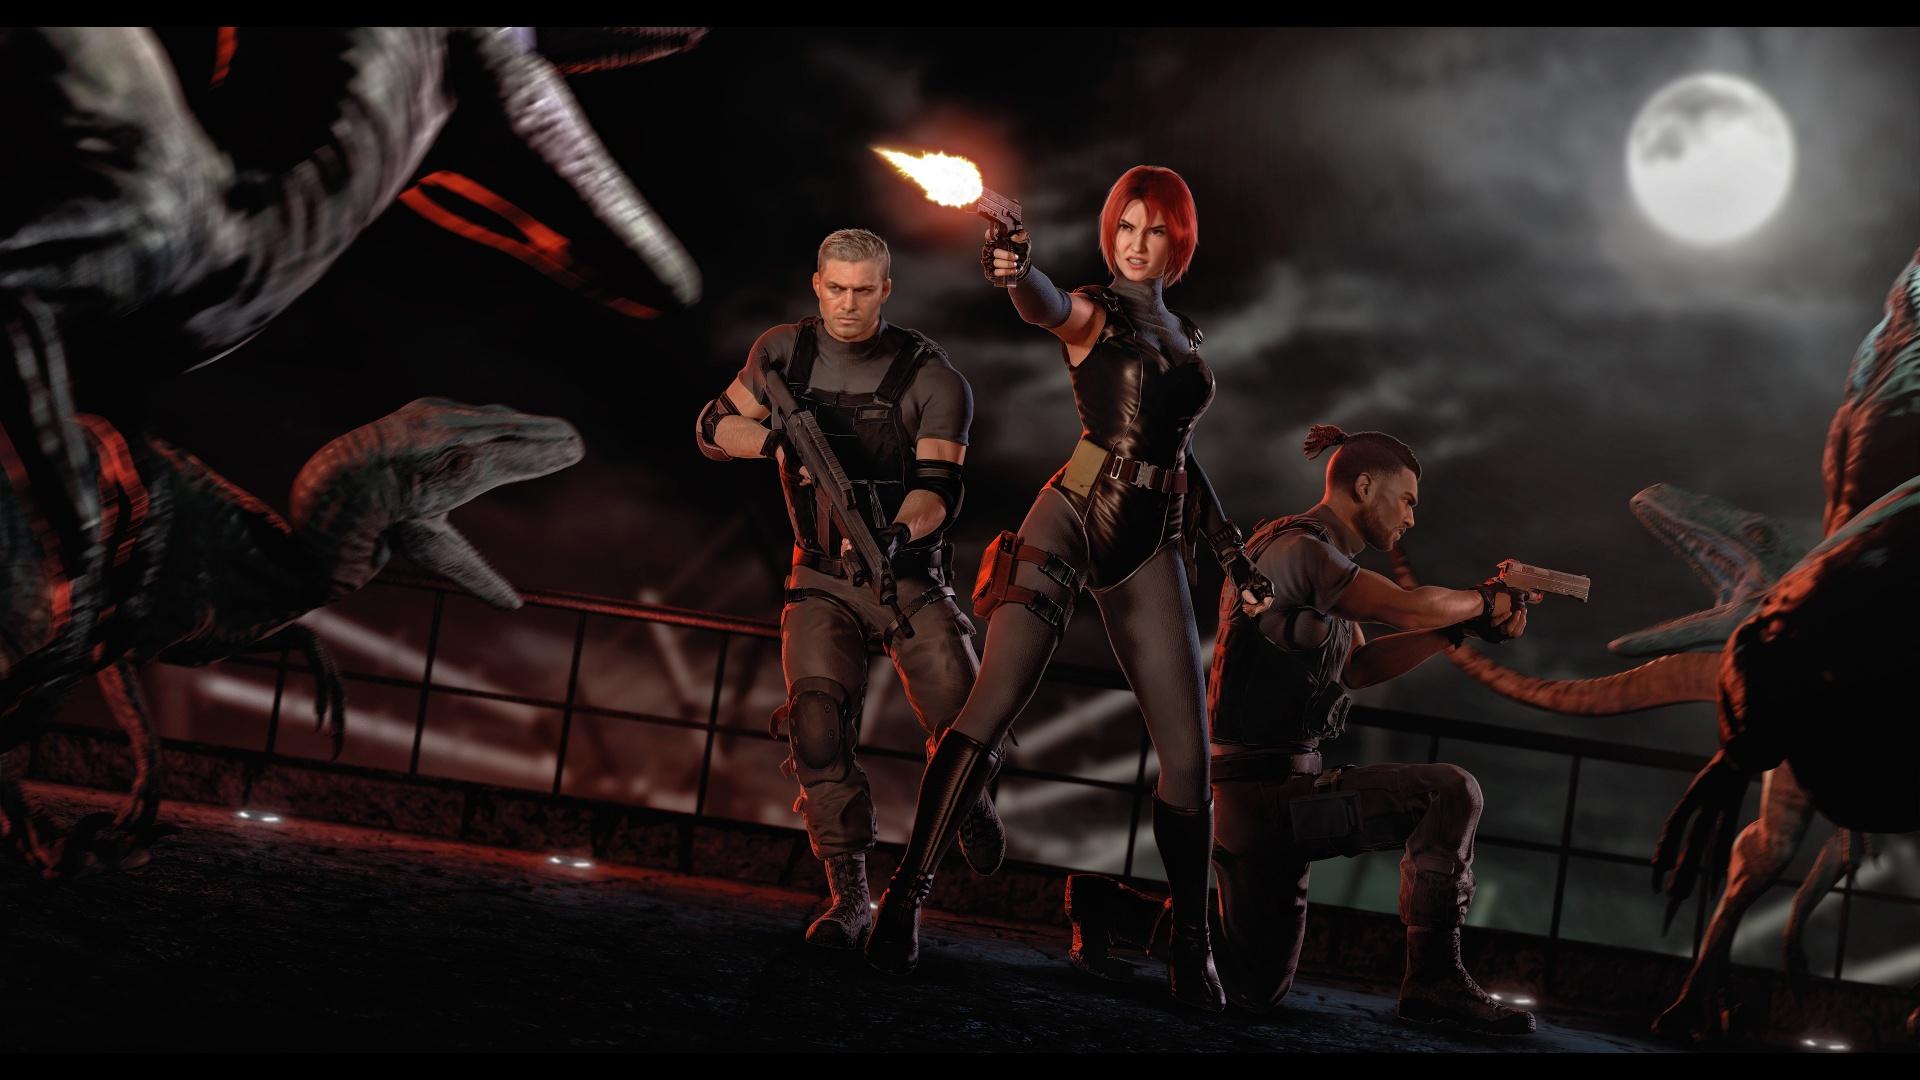 Capcom Vancouver предлагала ребут Dino Crisis, новую Onimusha иотменила множество игр